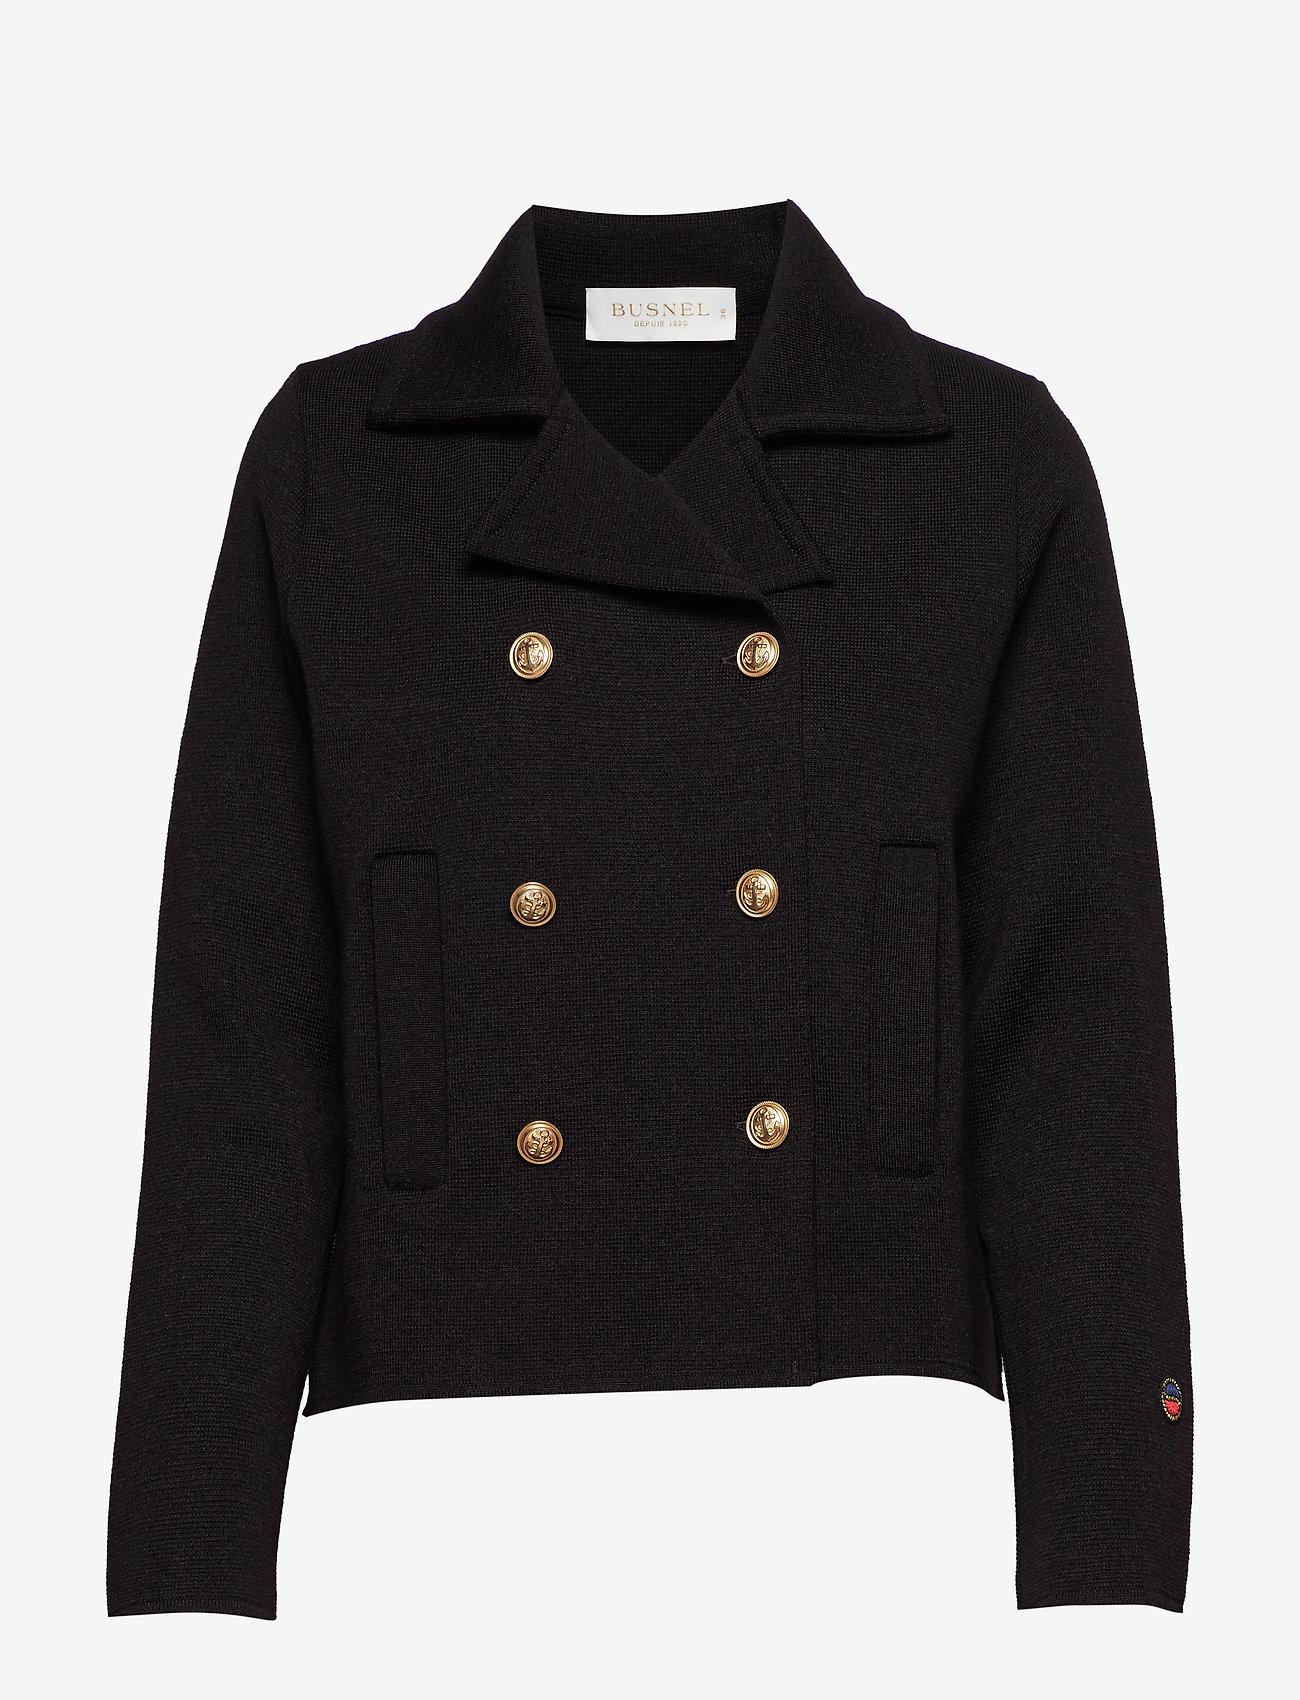 BUSNEL - Indra jacket - light jackets - black - 0